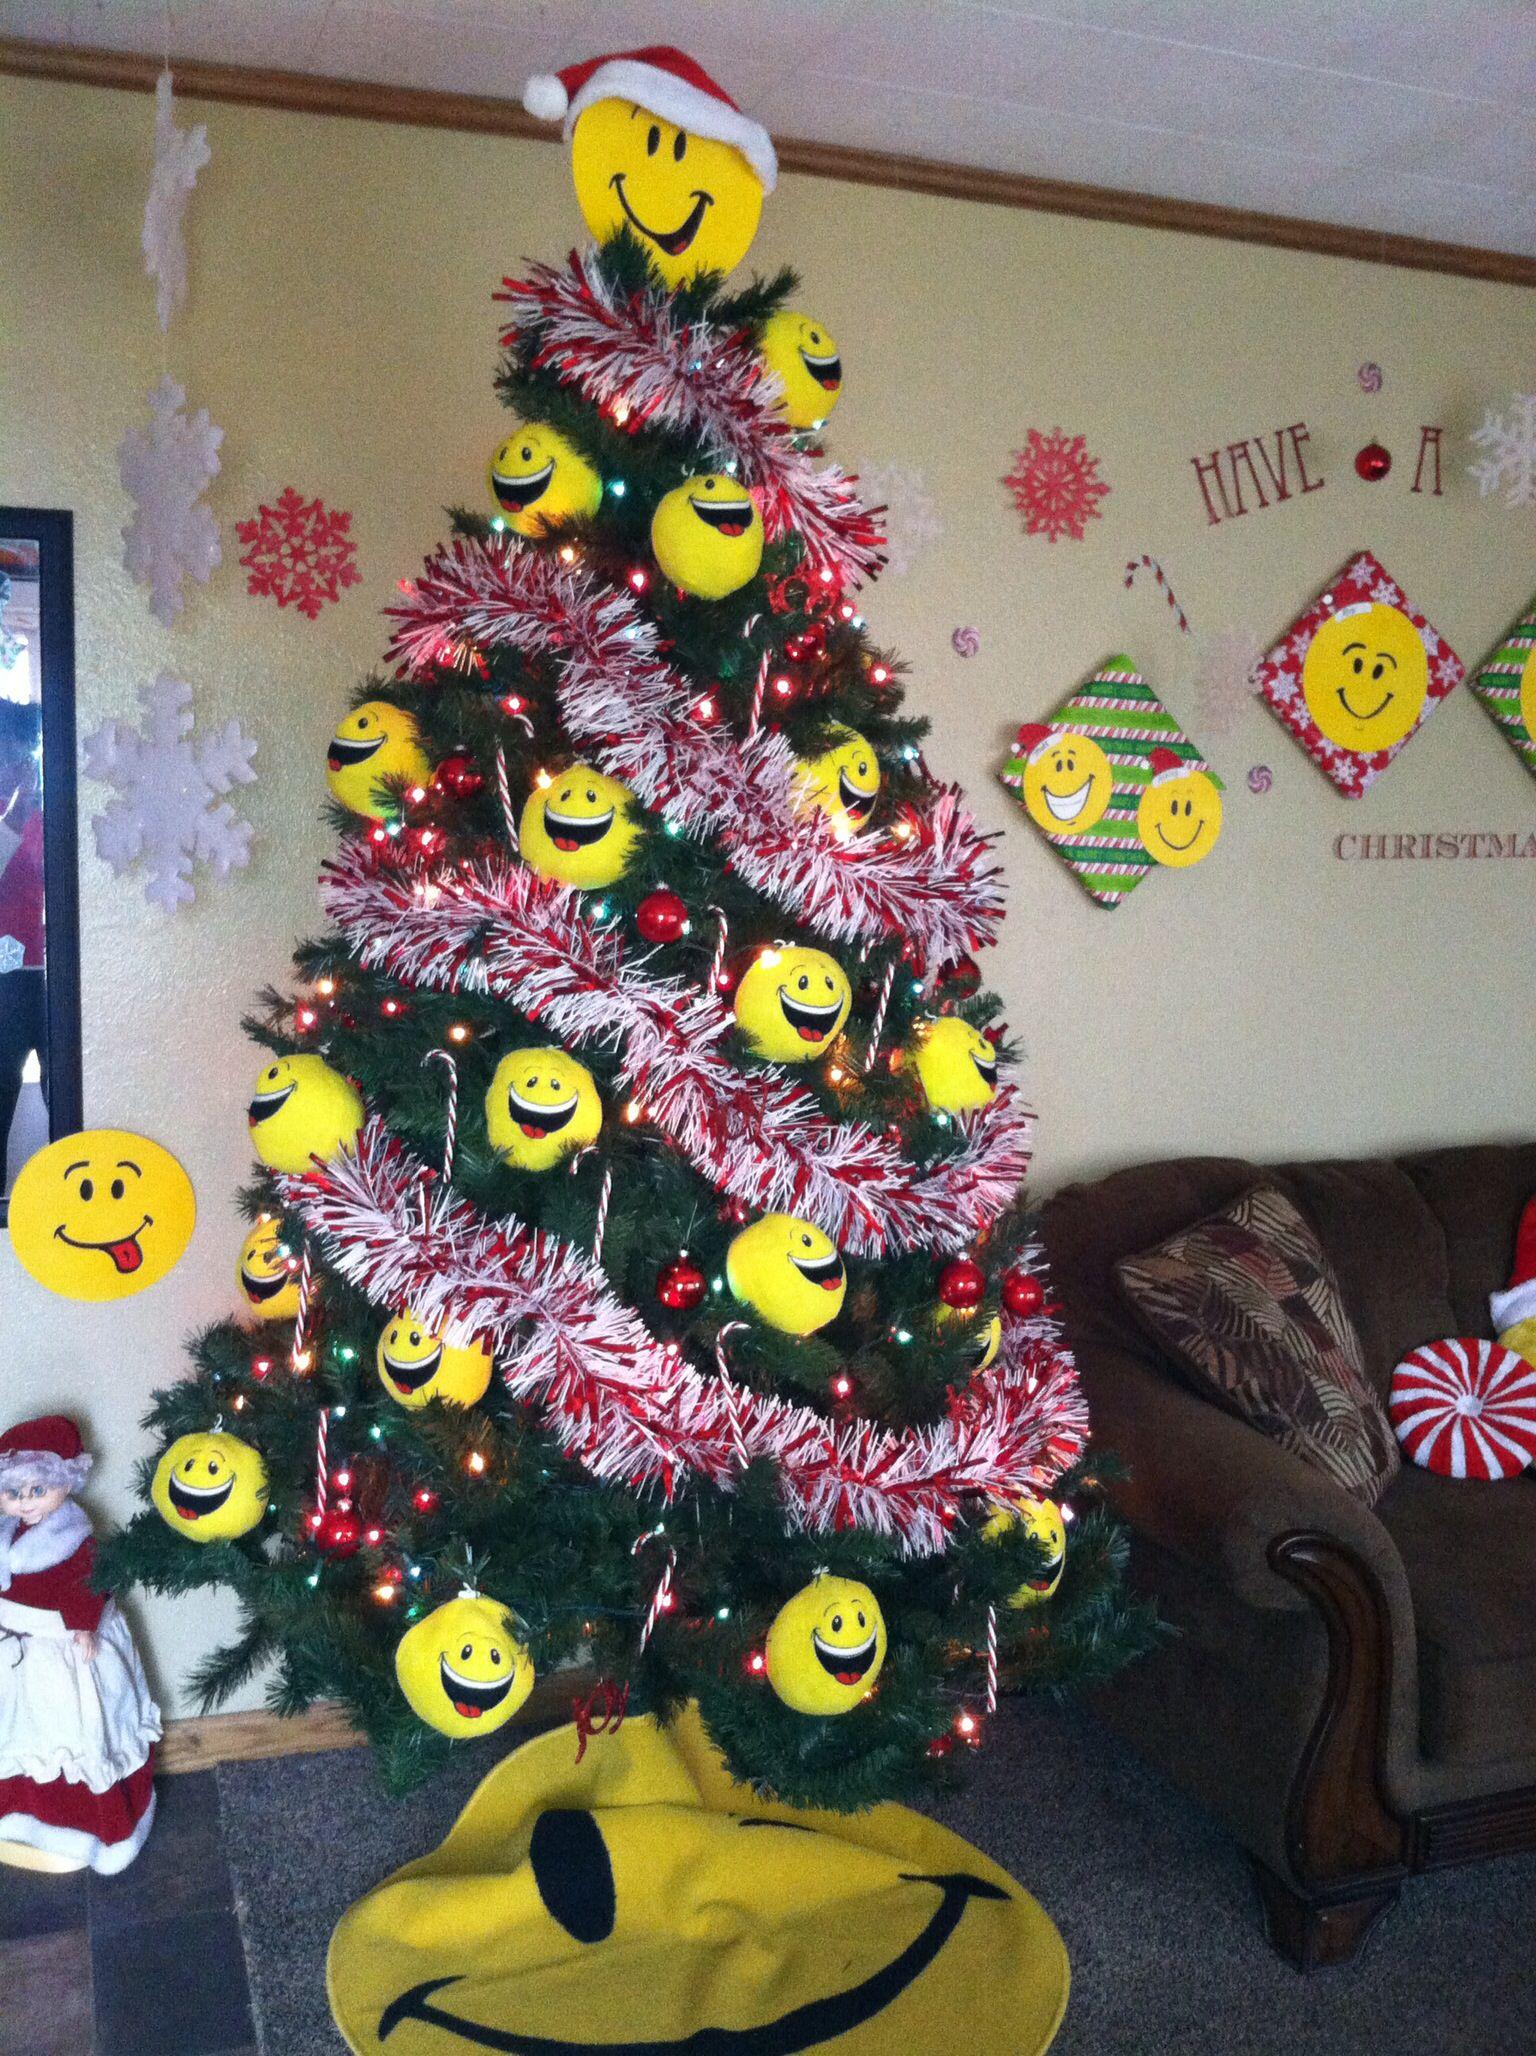 Smiley Face Christmas Tree Joy Emoji Christmas Tree Unusual Christmas Trees Emoji Christmas